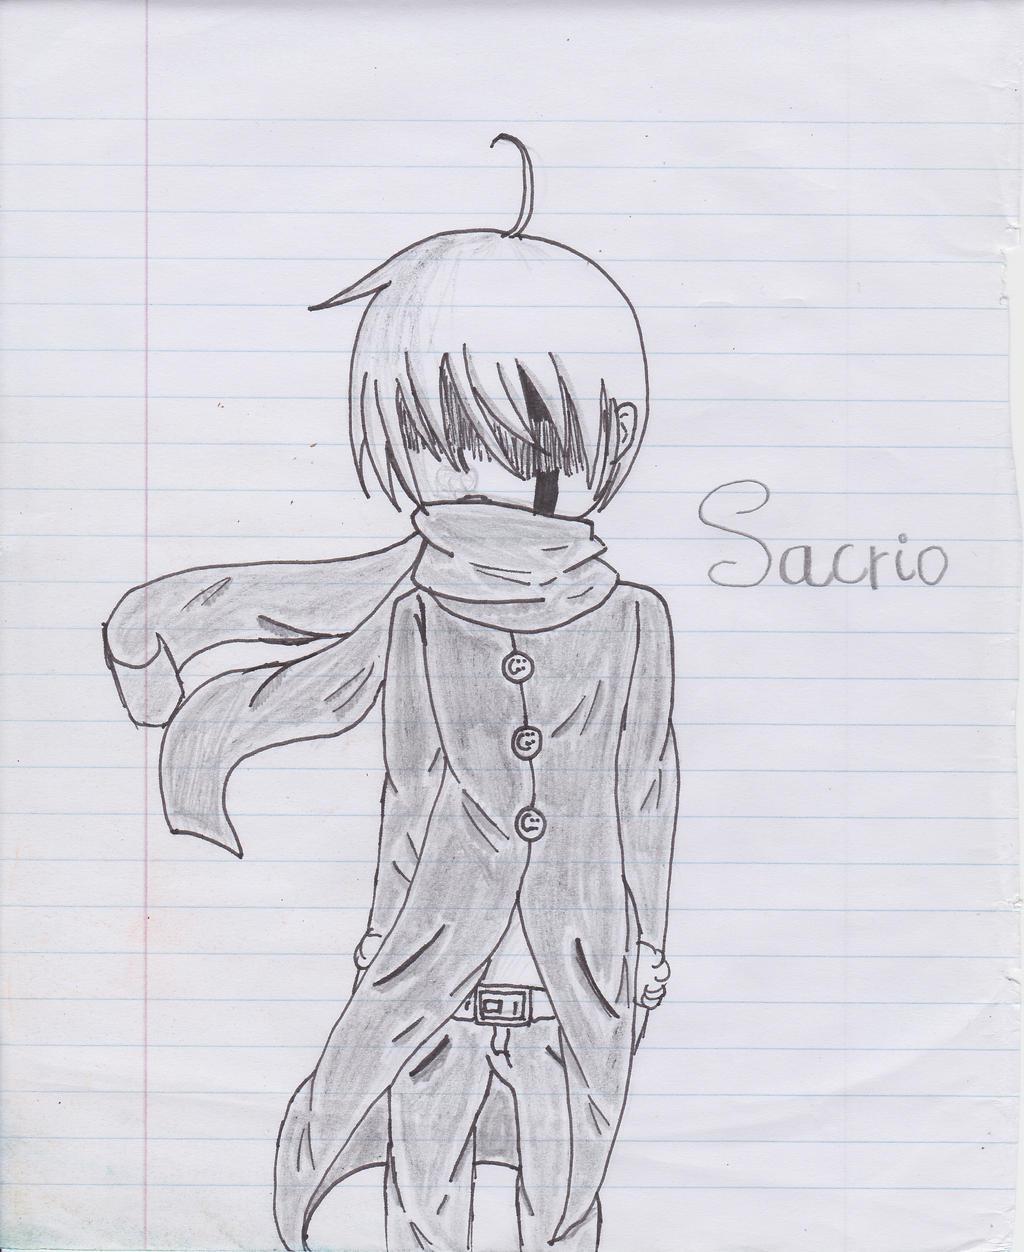 Sacrio by ravensaravengirl